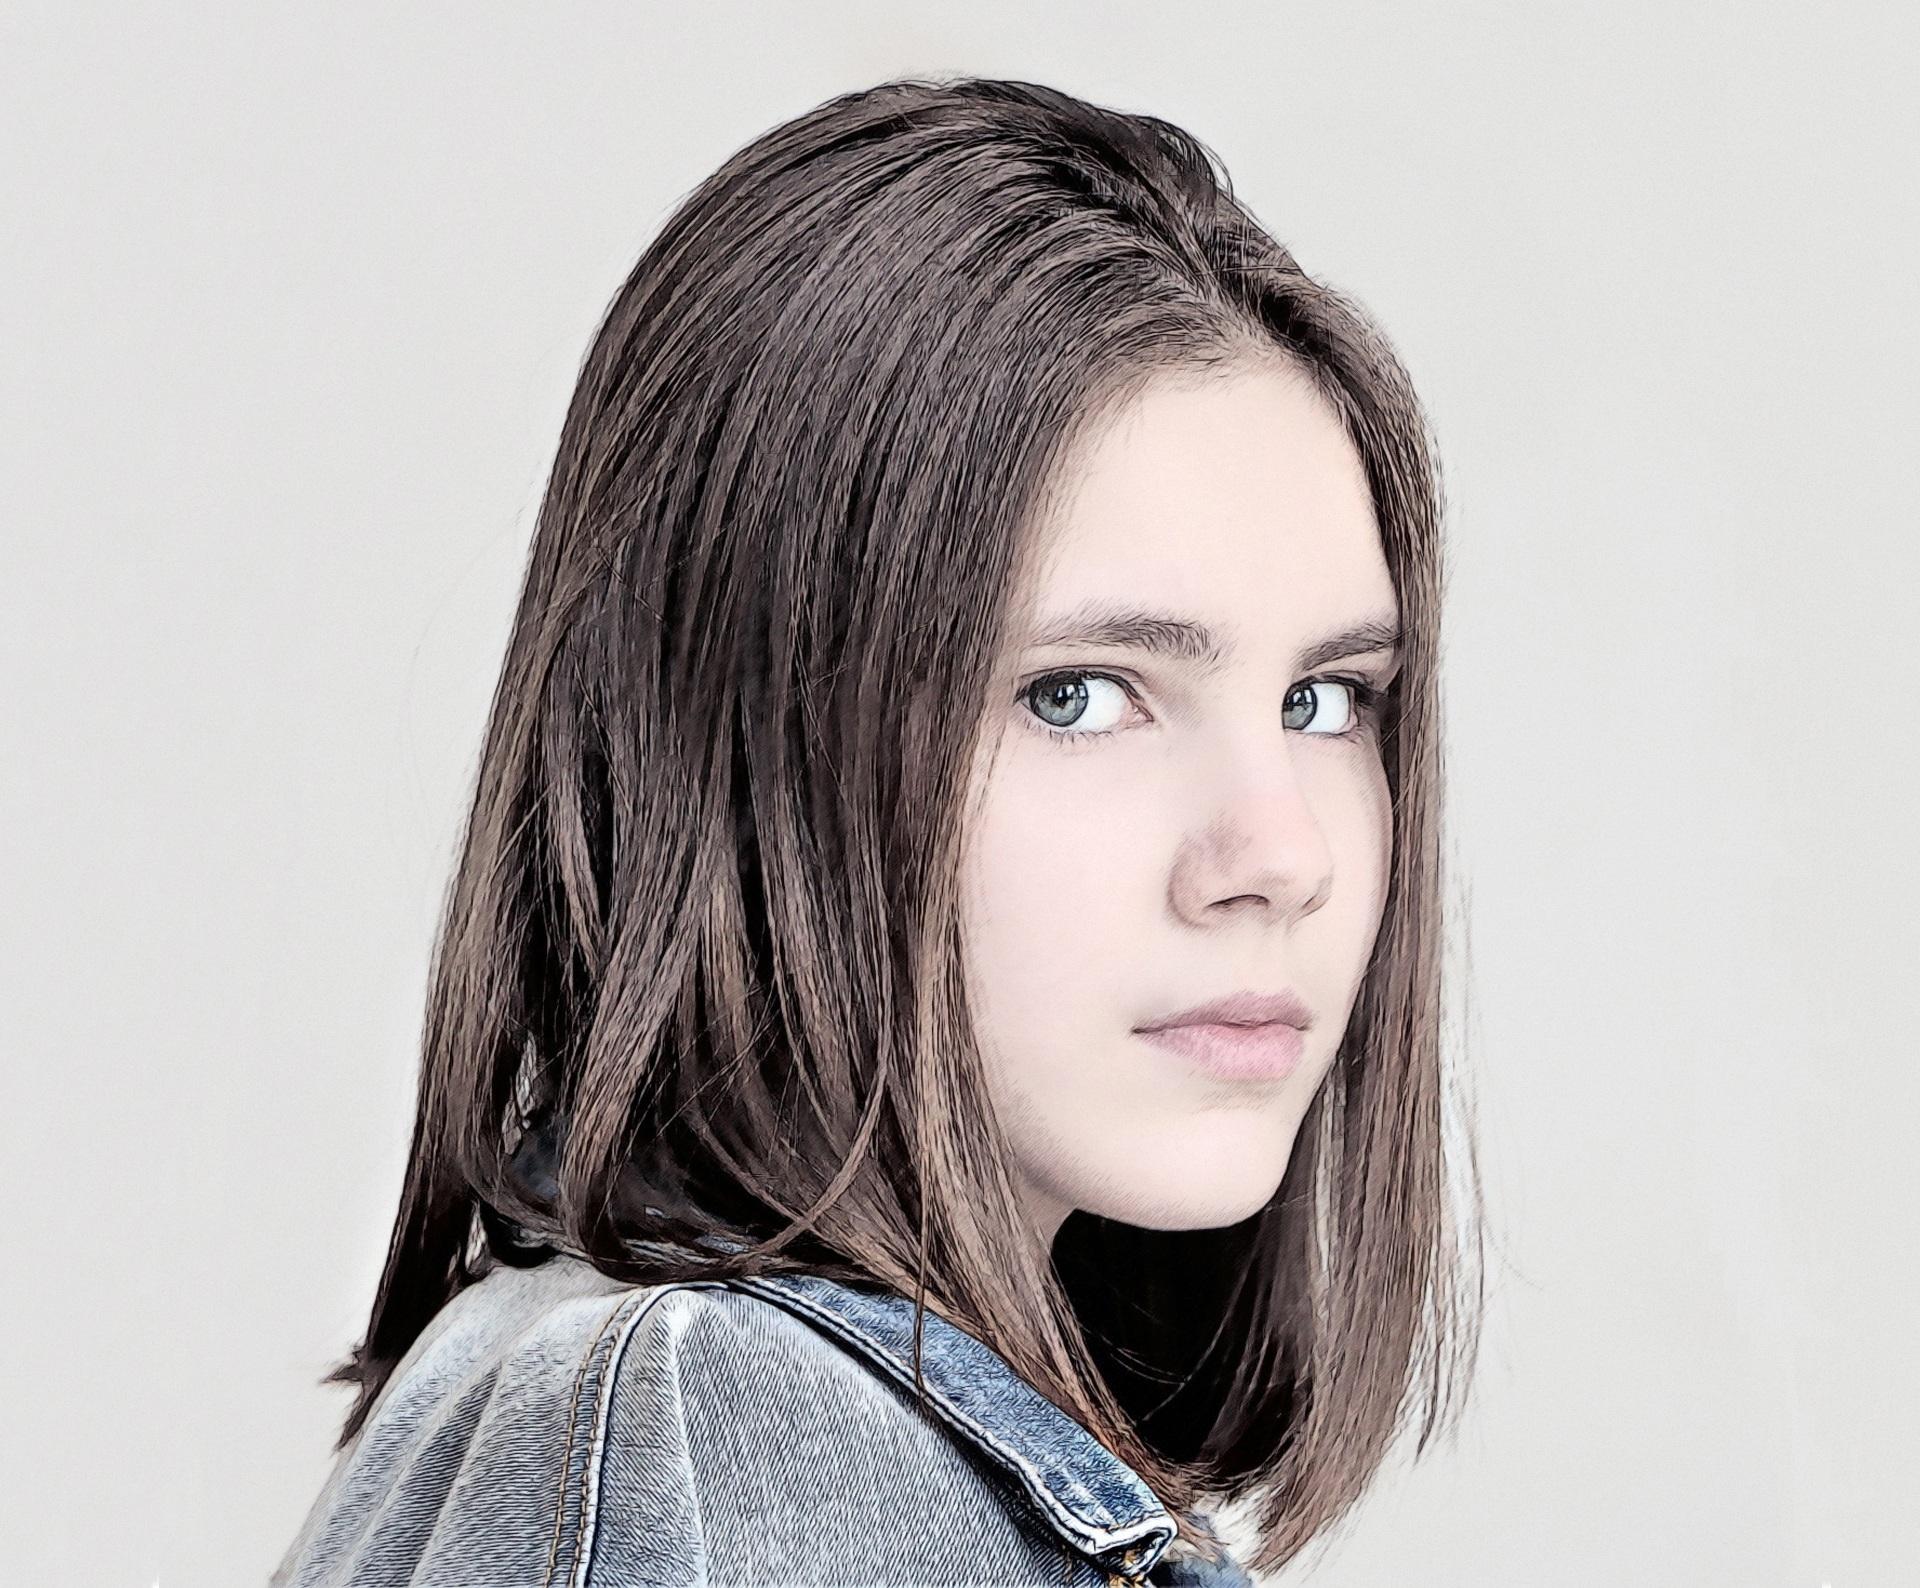 Imagen gratis modelo adolescente